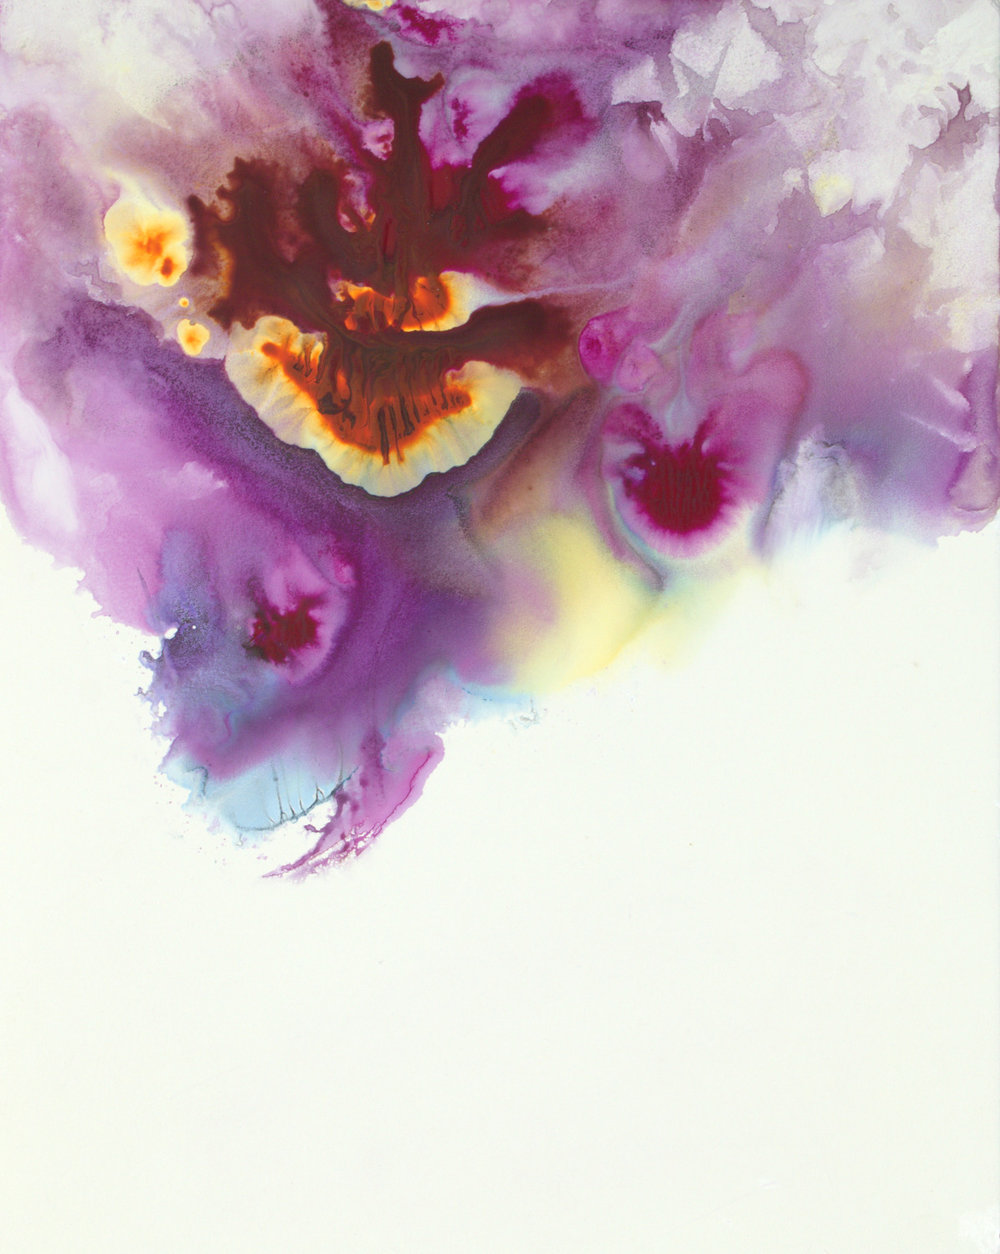 Purple Pansy Petals I - 14x11